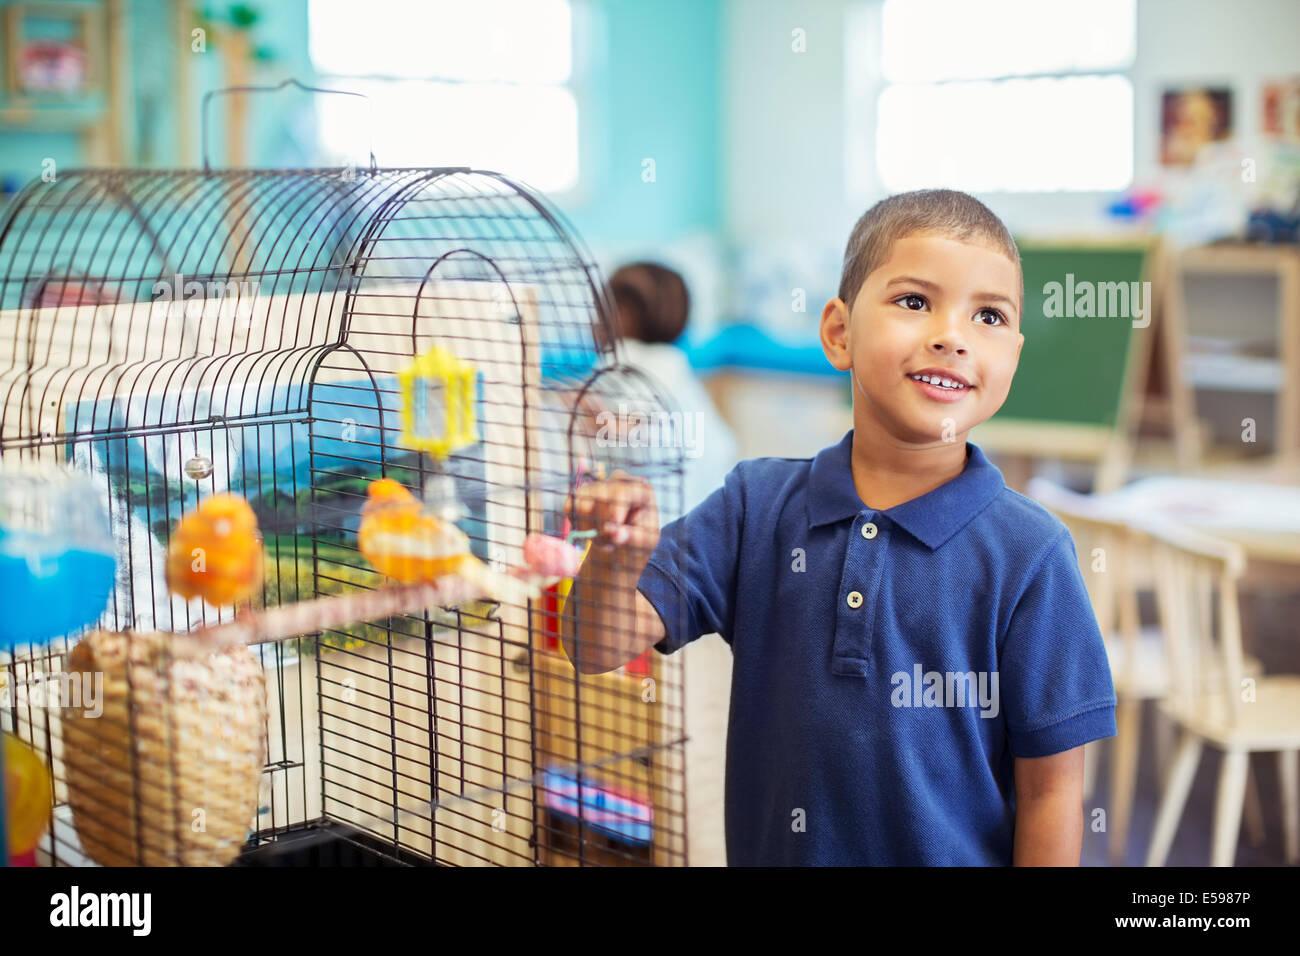 Student examining birdcage in classroom - Stock Image